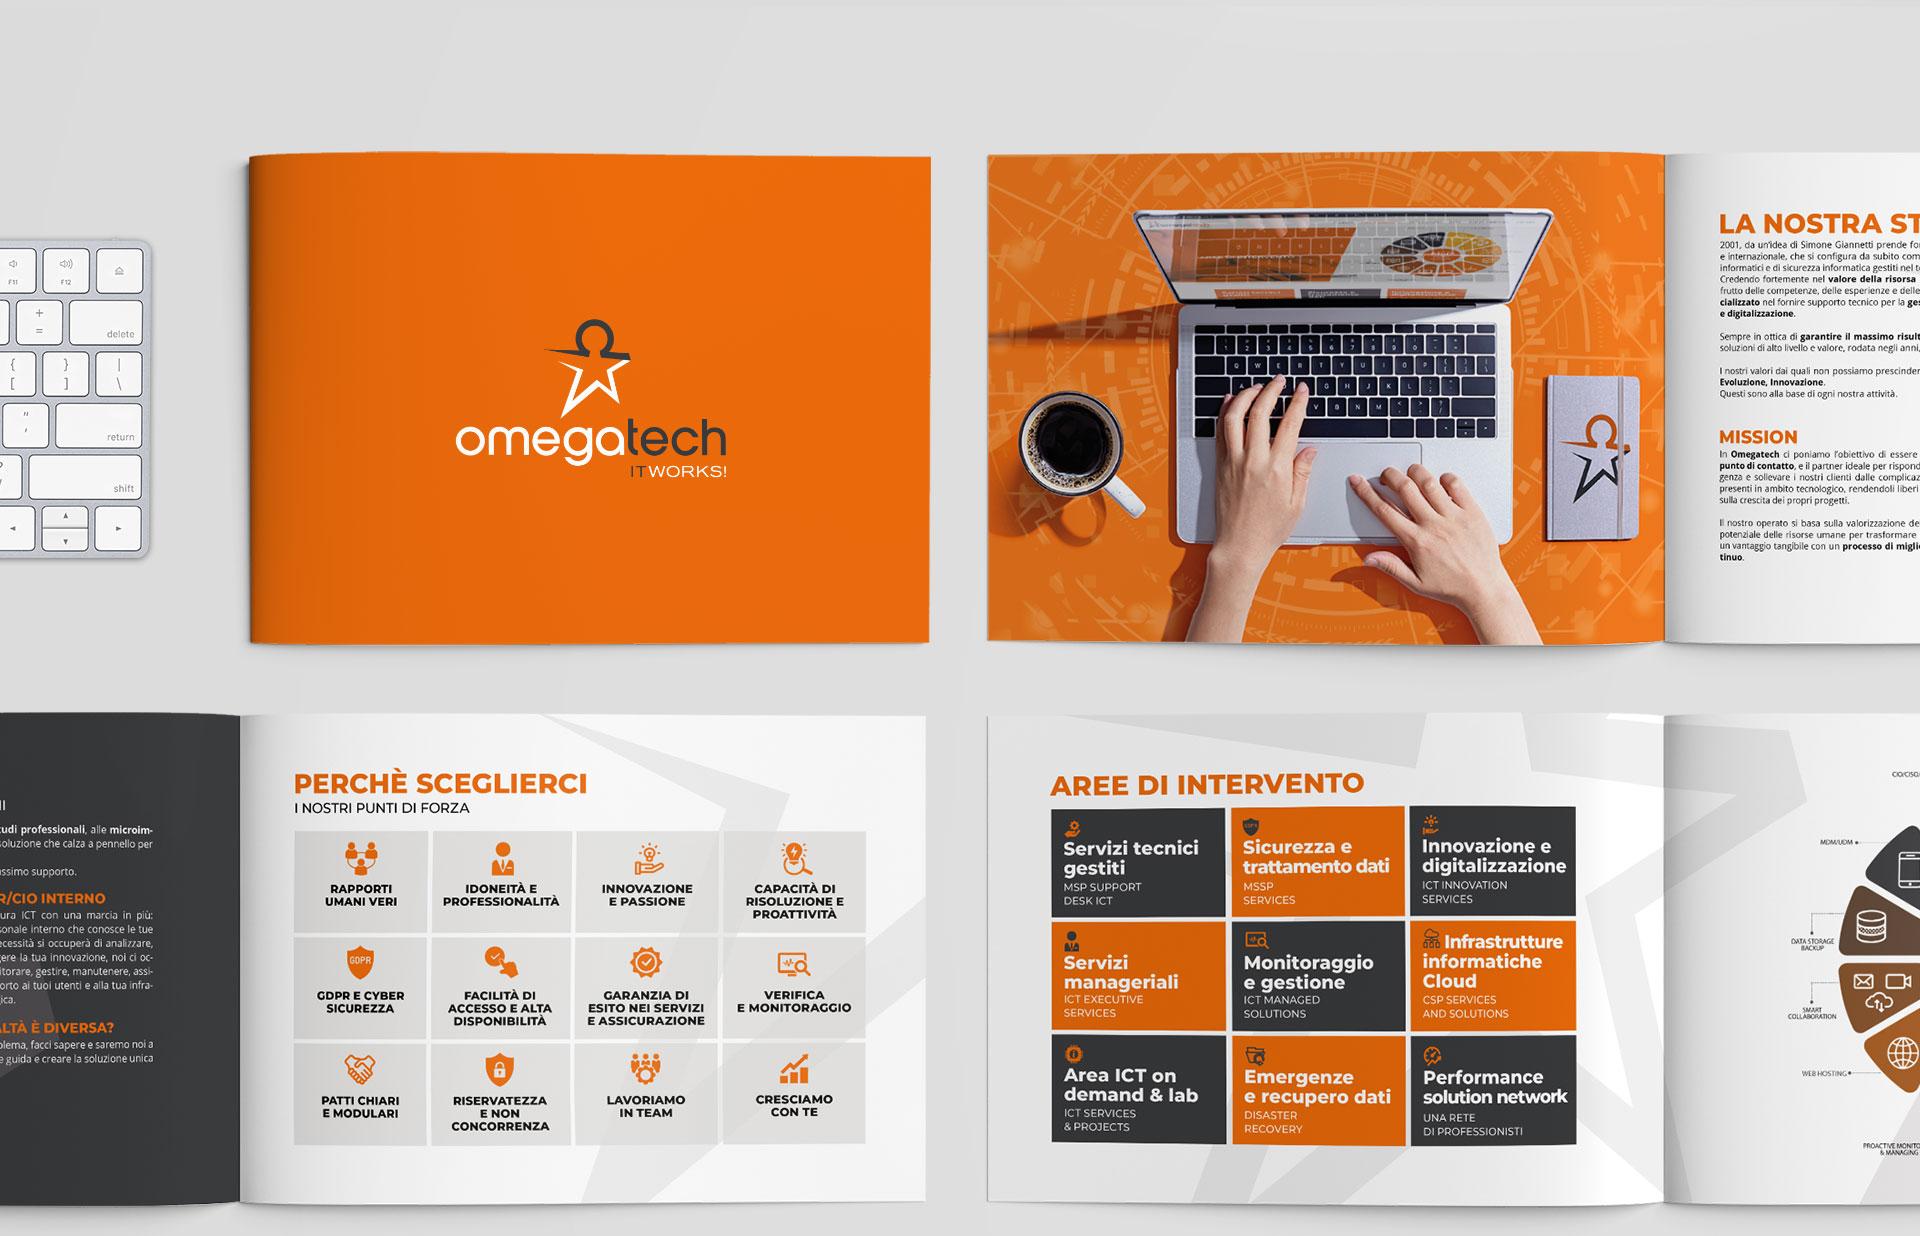 omegatech-zerouno-design-branding-brochure-1